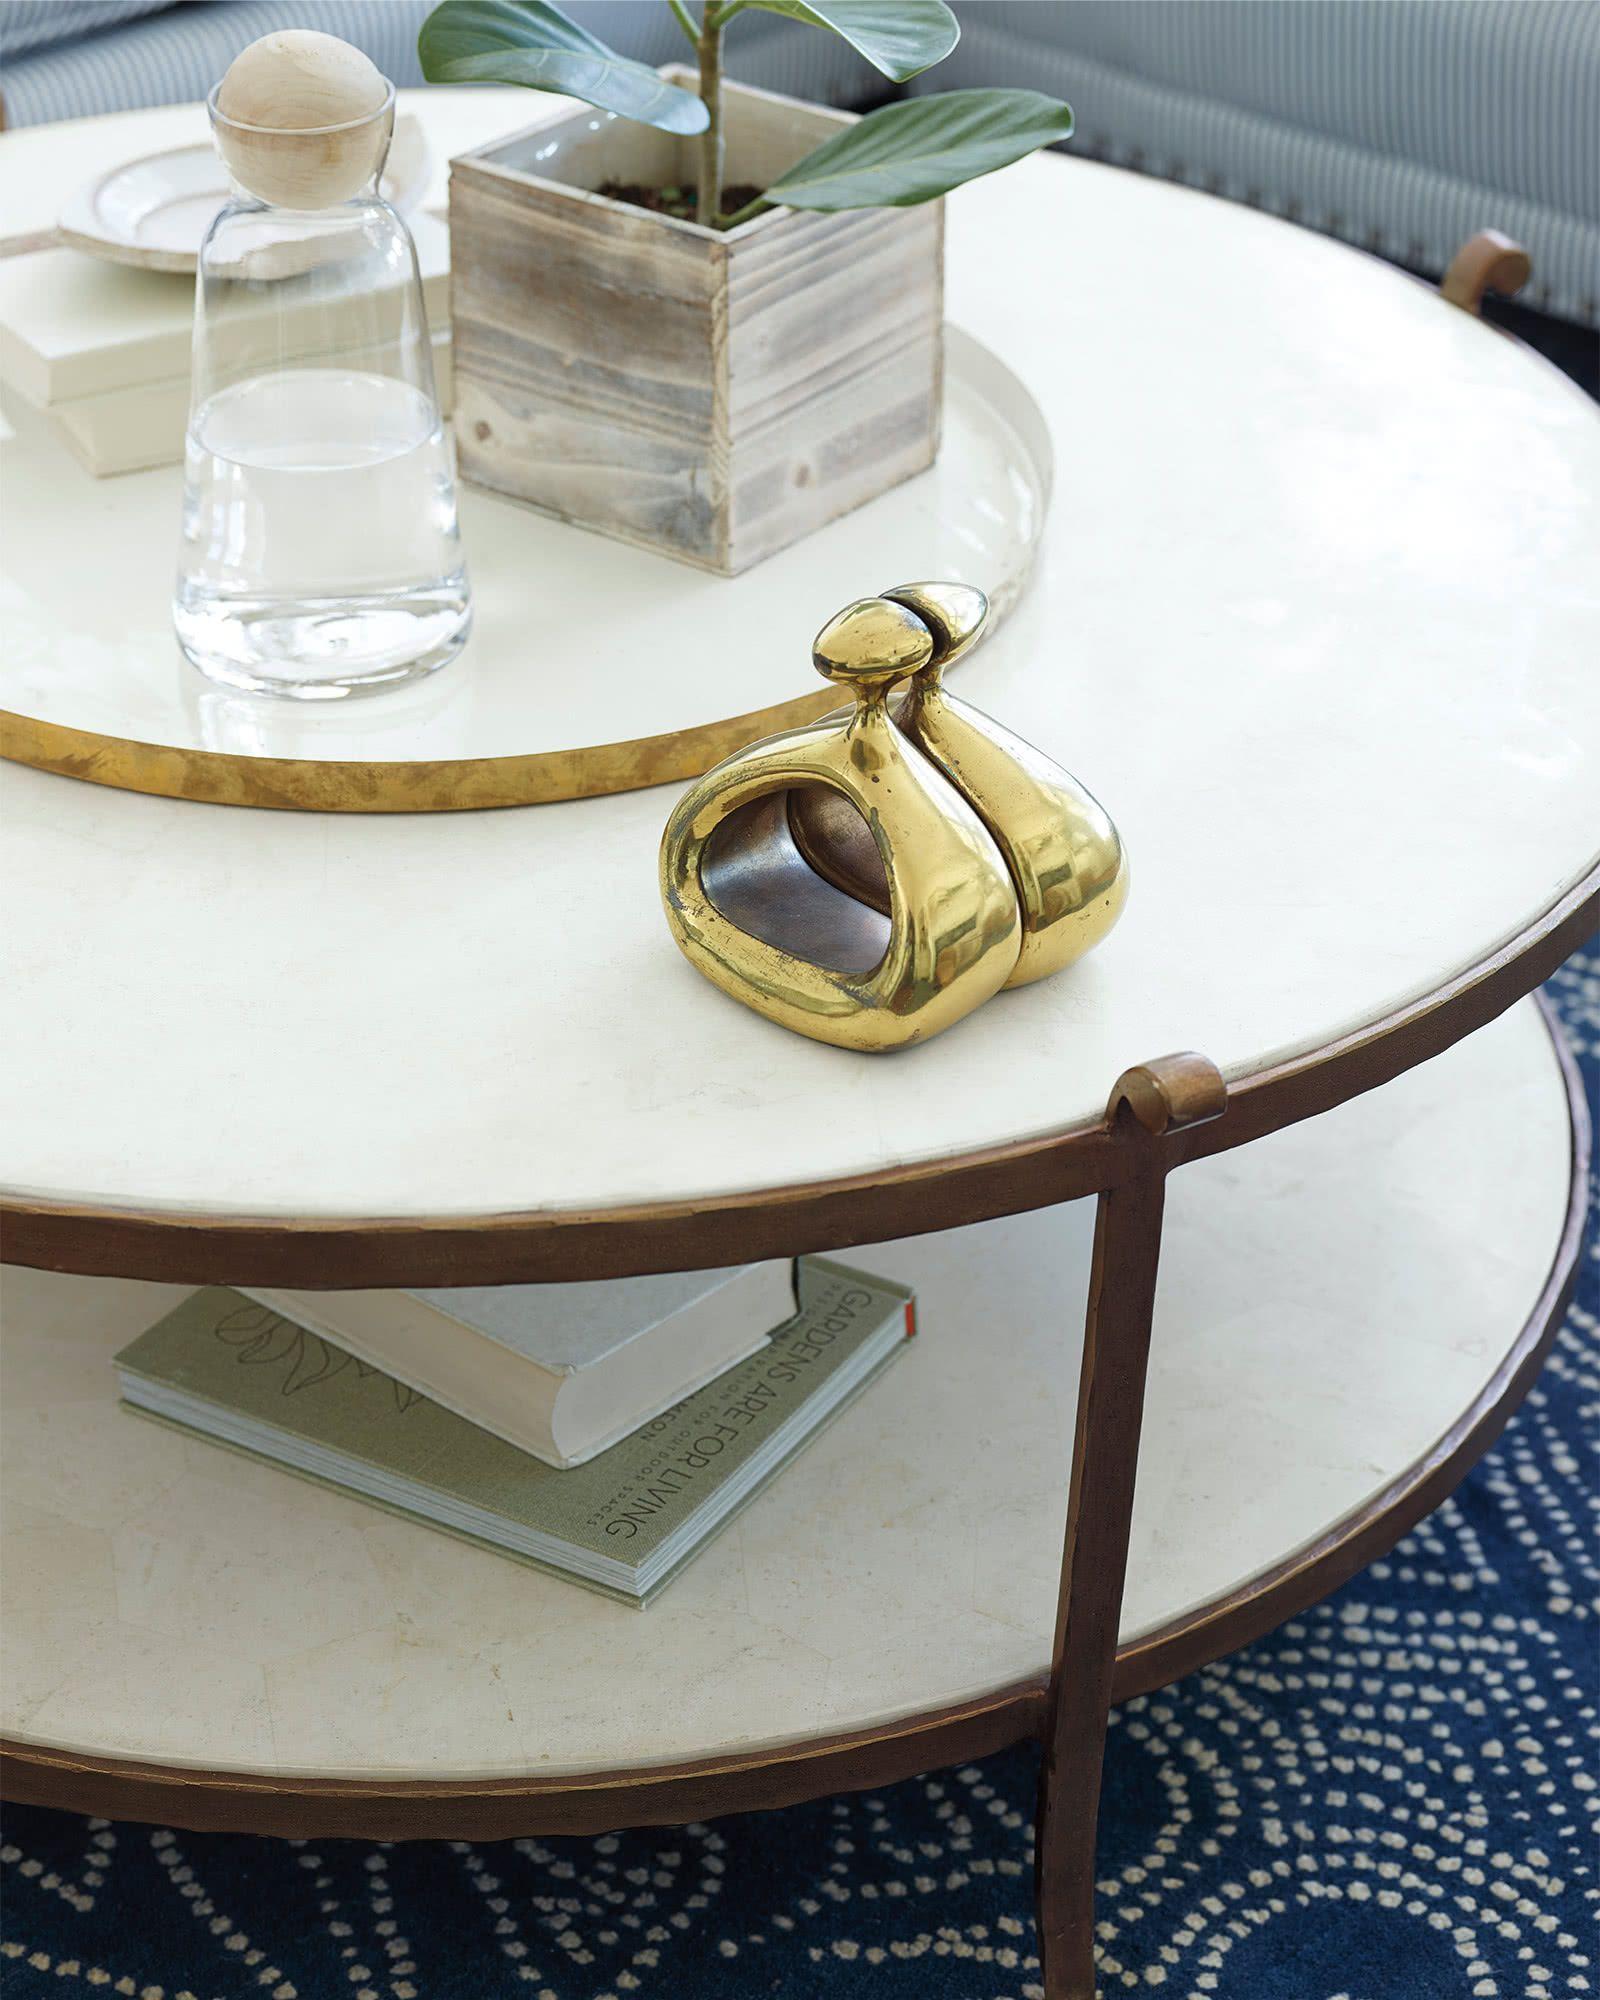 St Germain Stone Coffee Table Serena Lily Stone Coffee Table Coffee Table Luxury Furniture Design [ jpg ]